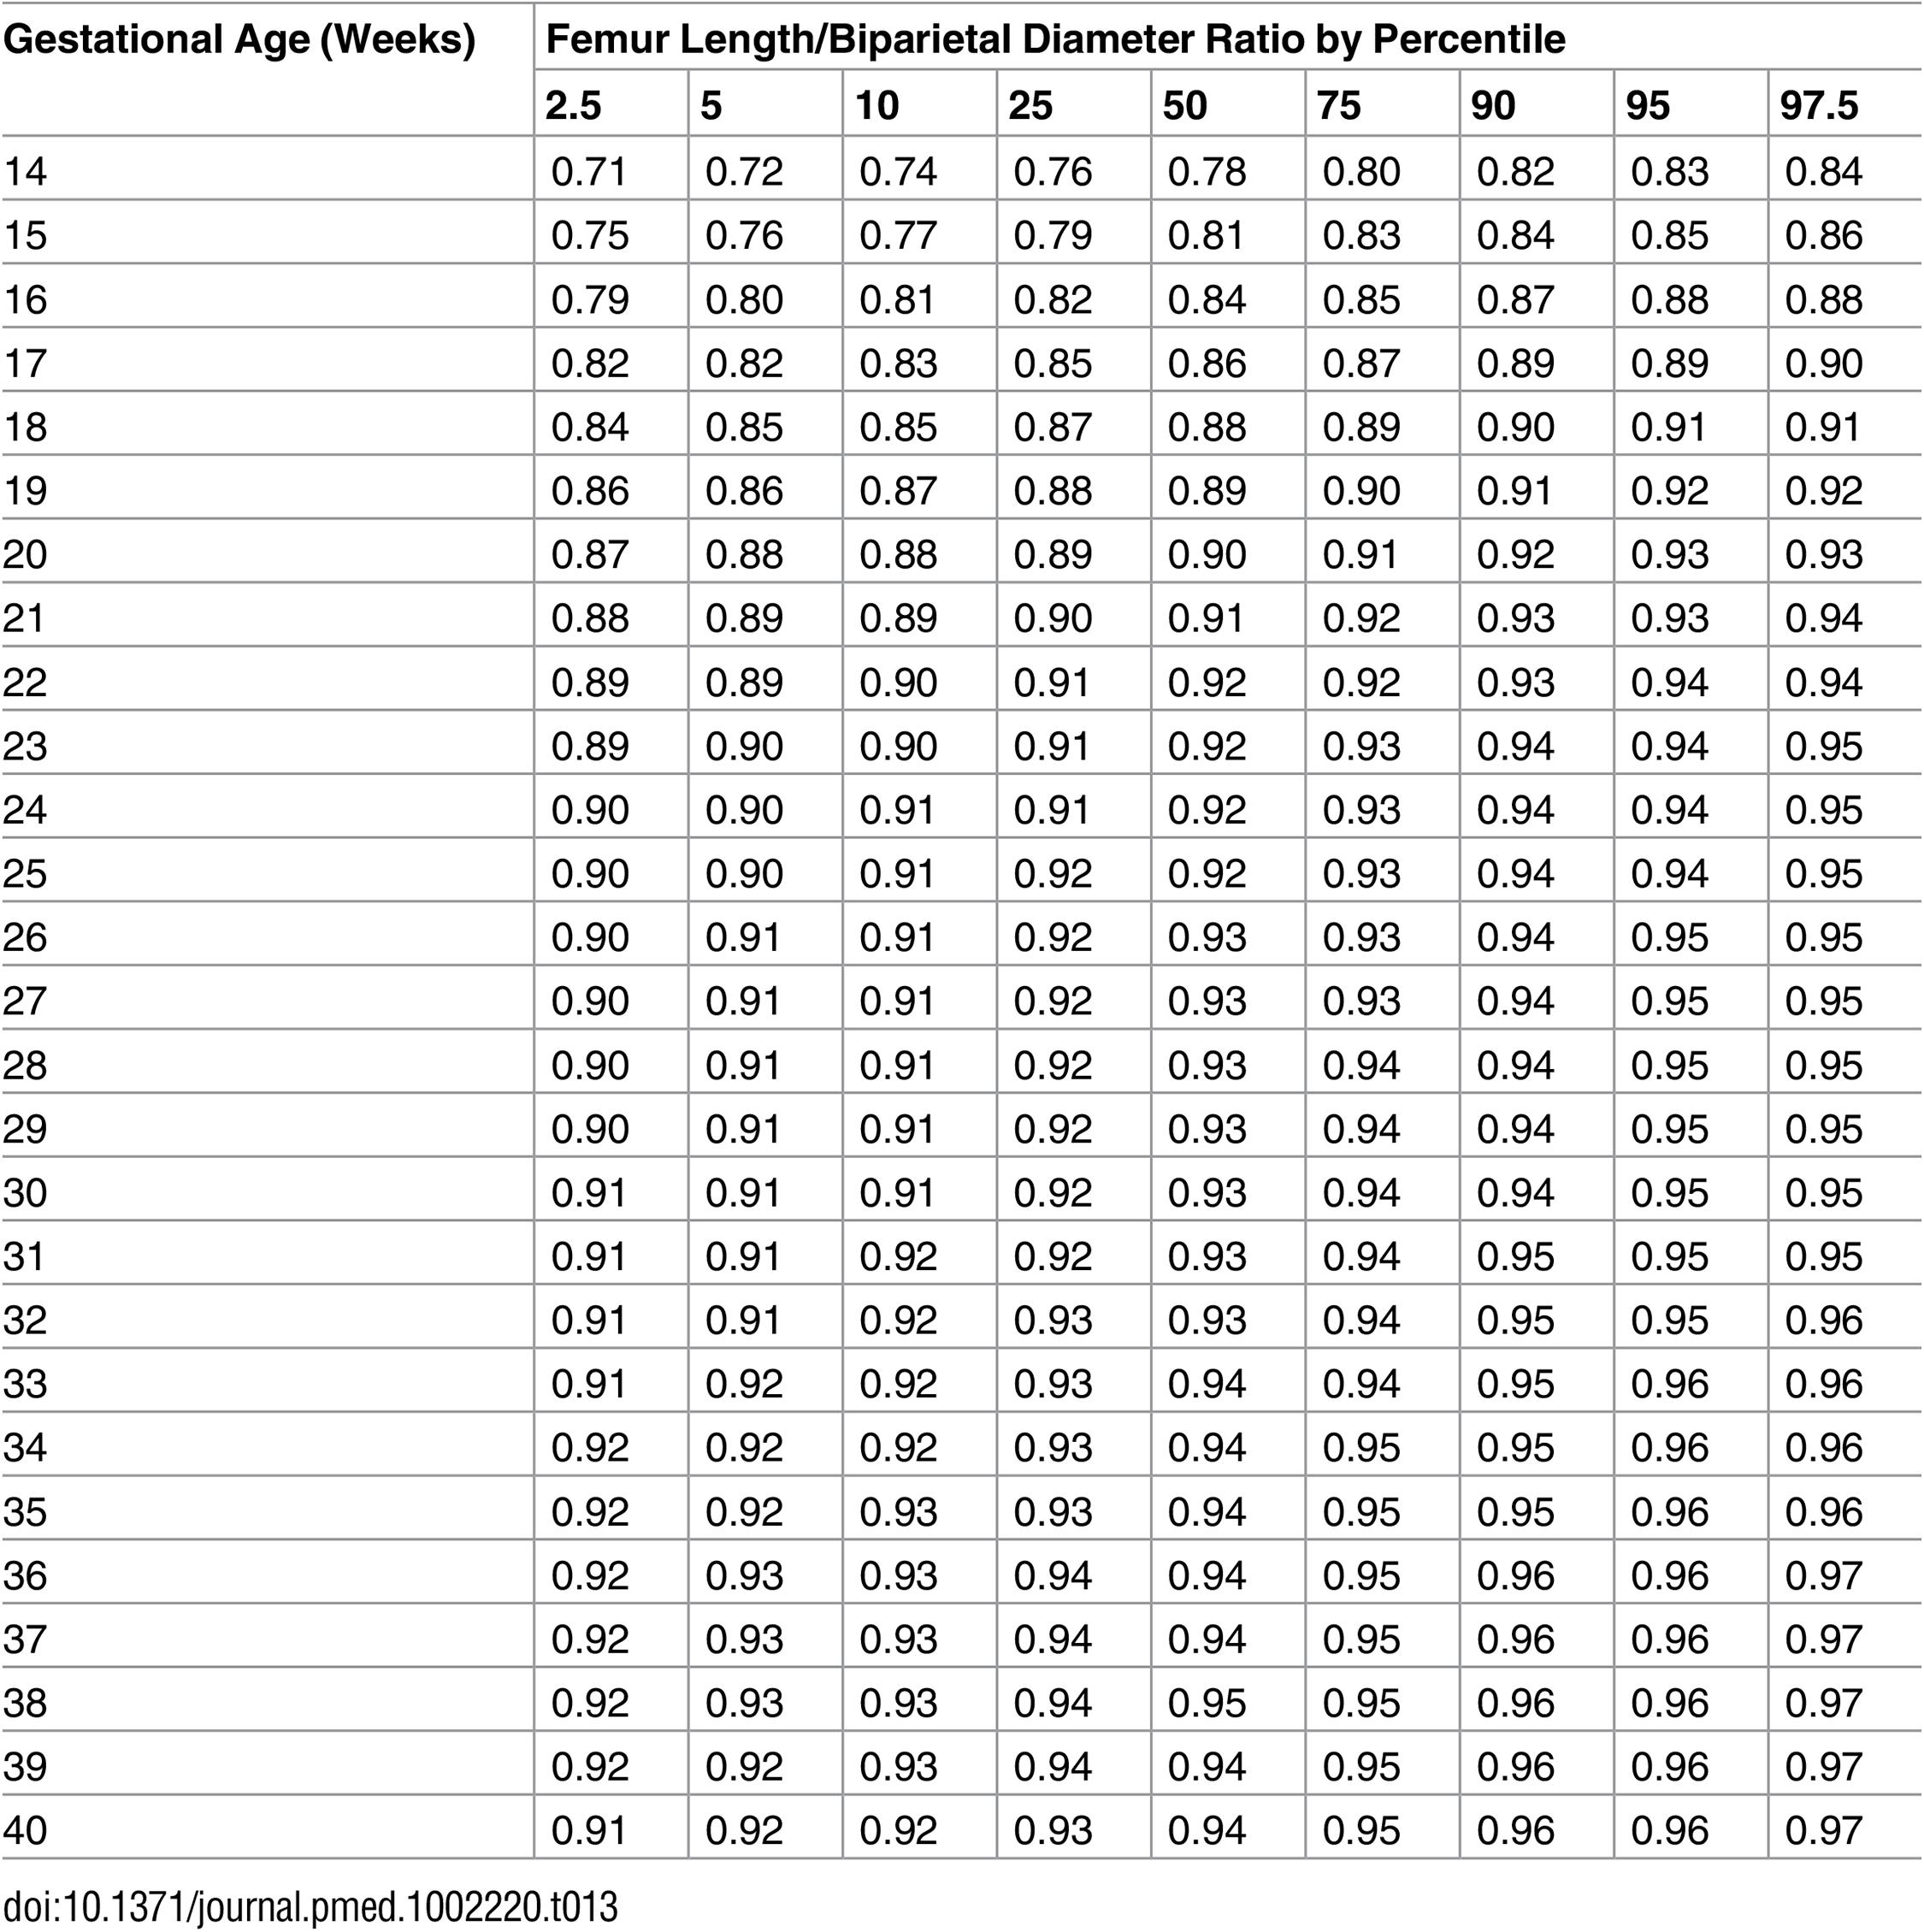 Growth chart for fetal femur length/biparietal diameter.